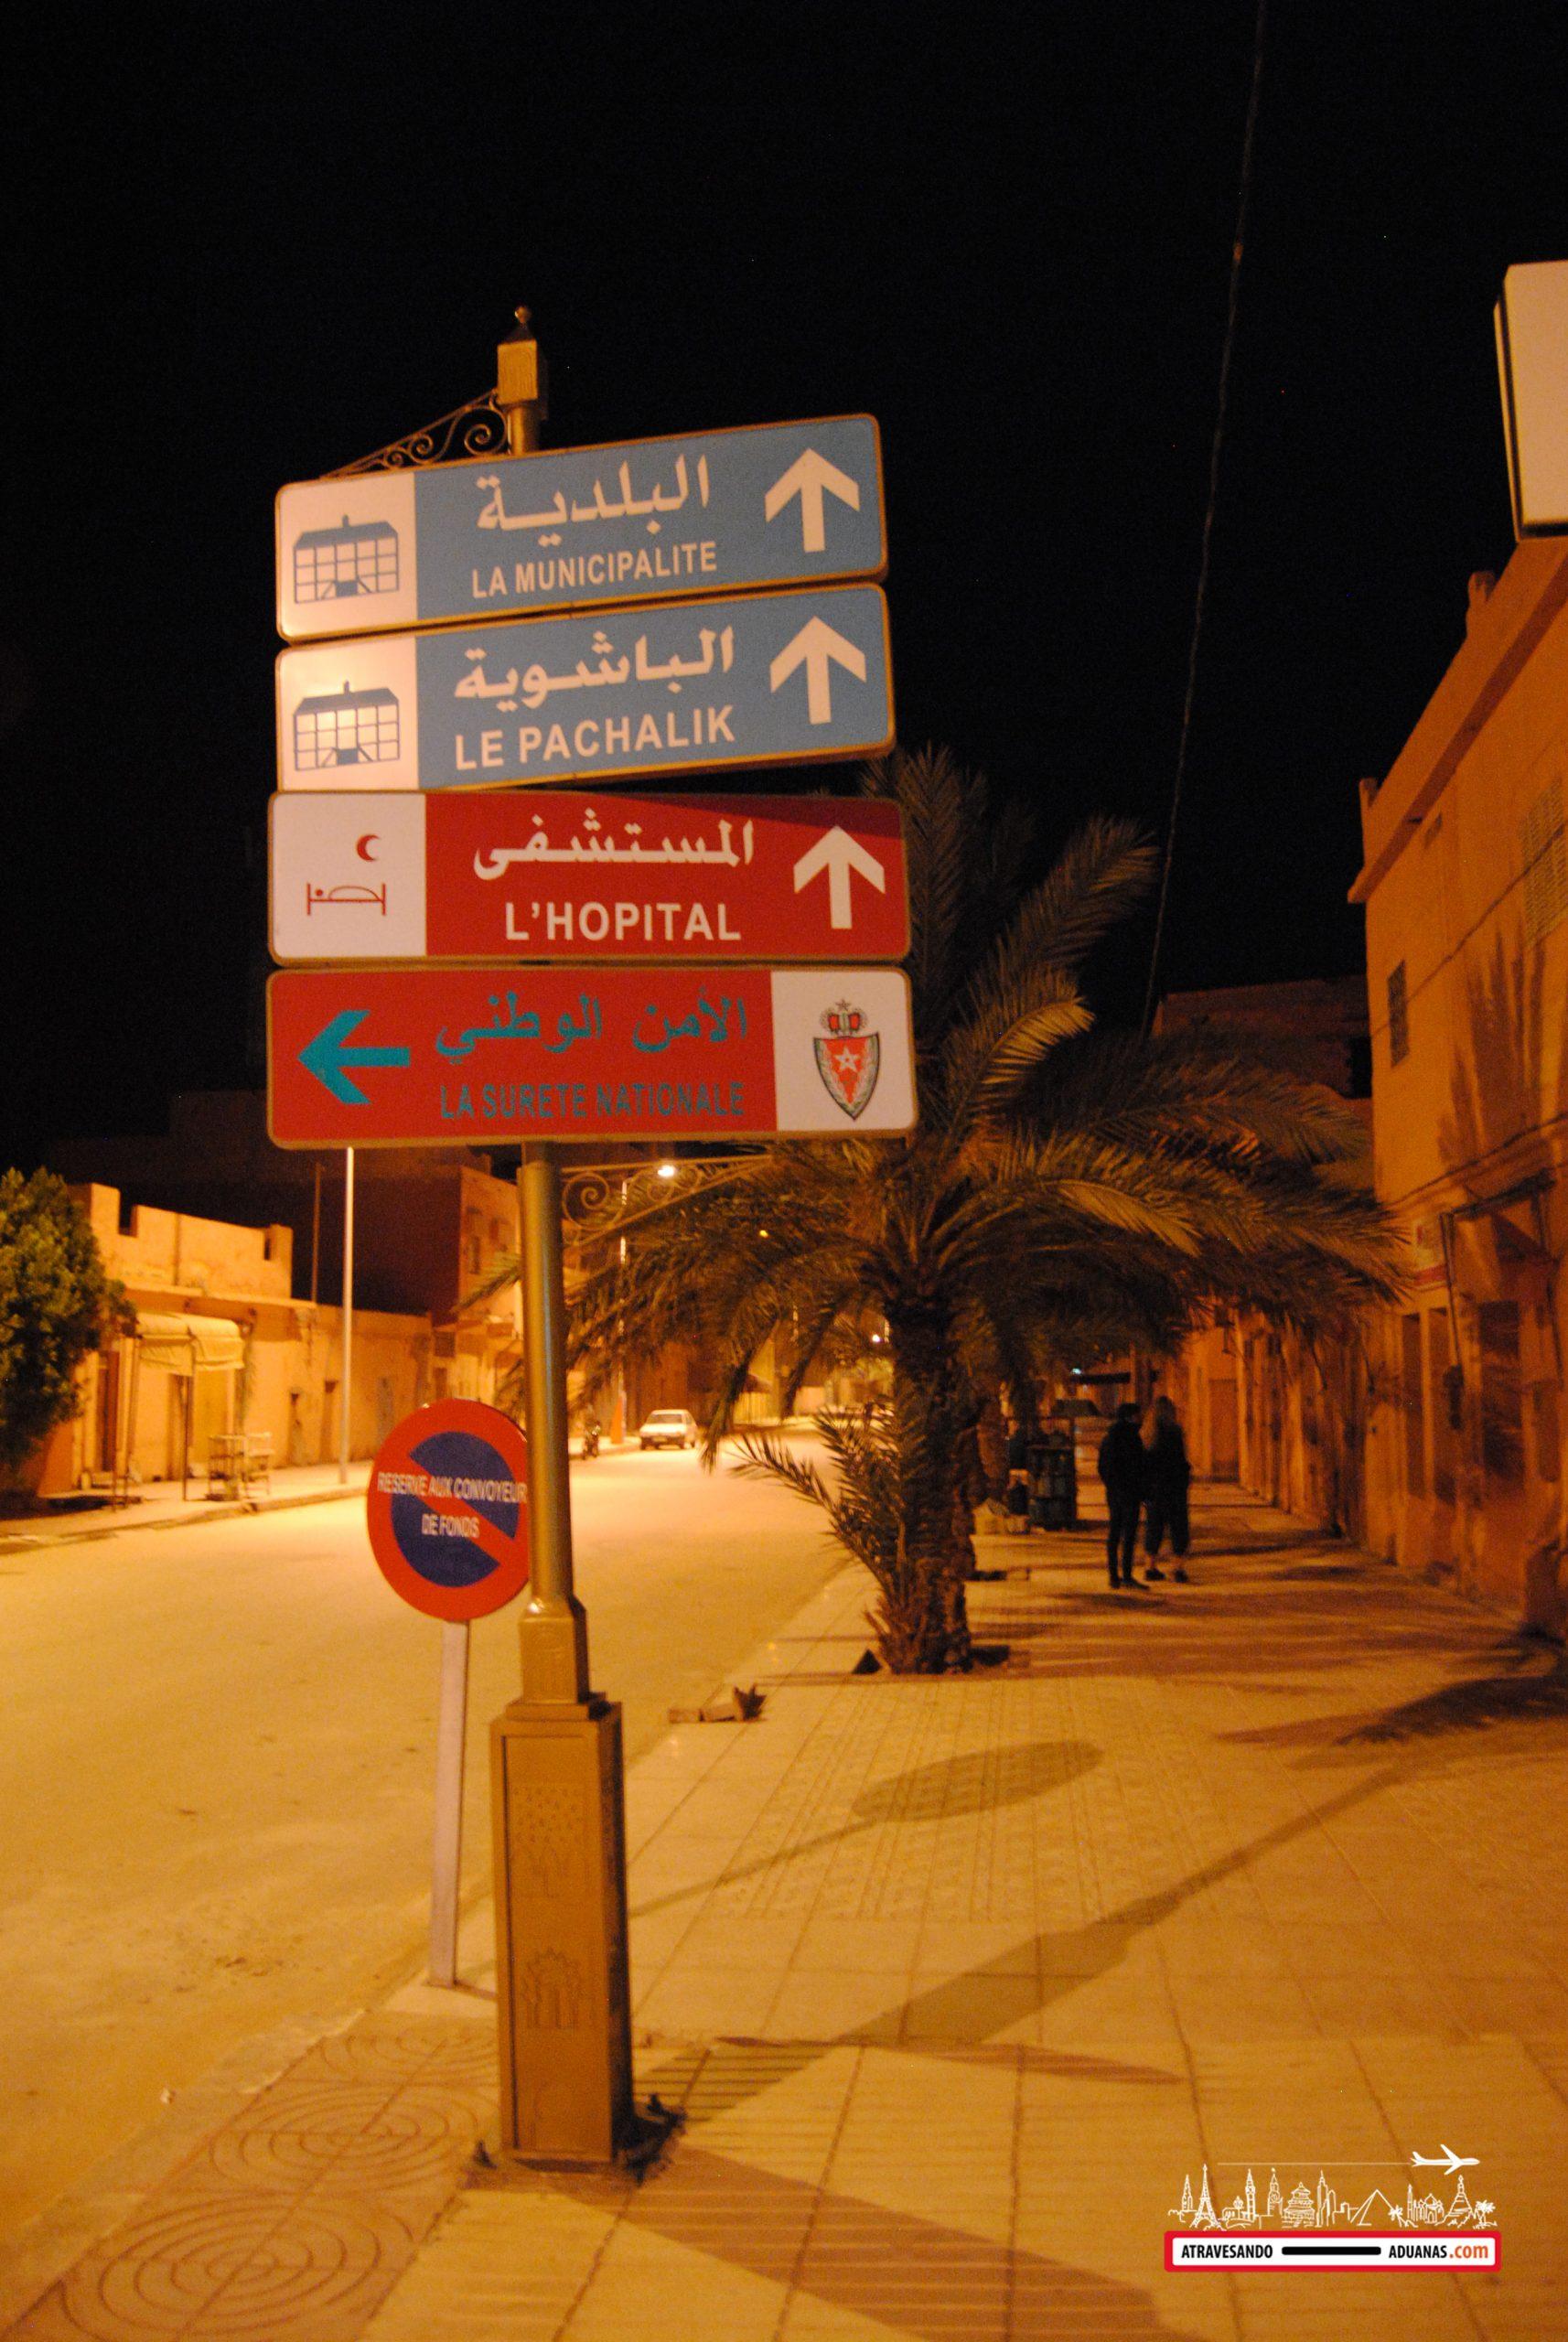 carteles indicando infraestructuras en figuig